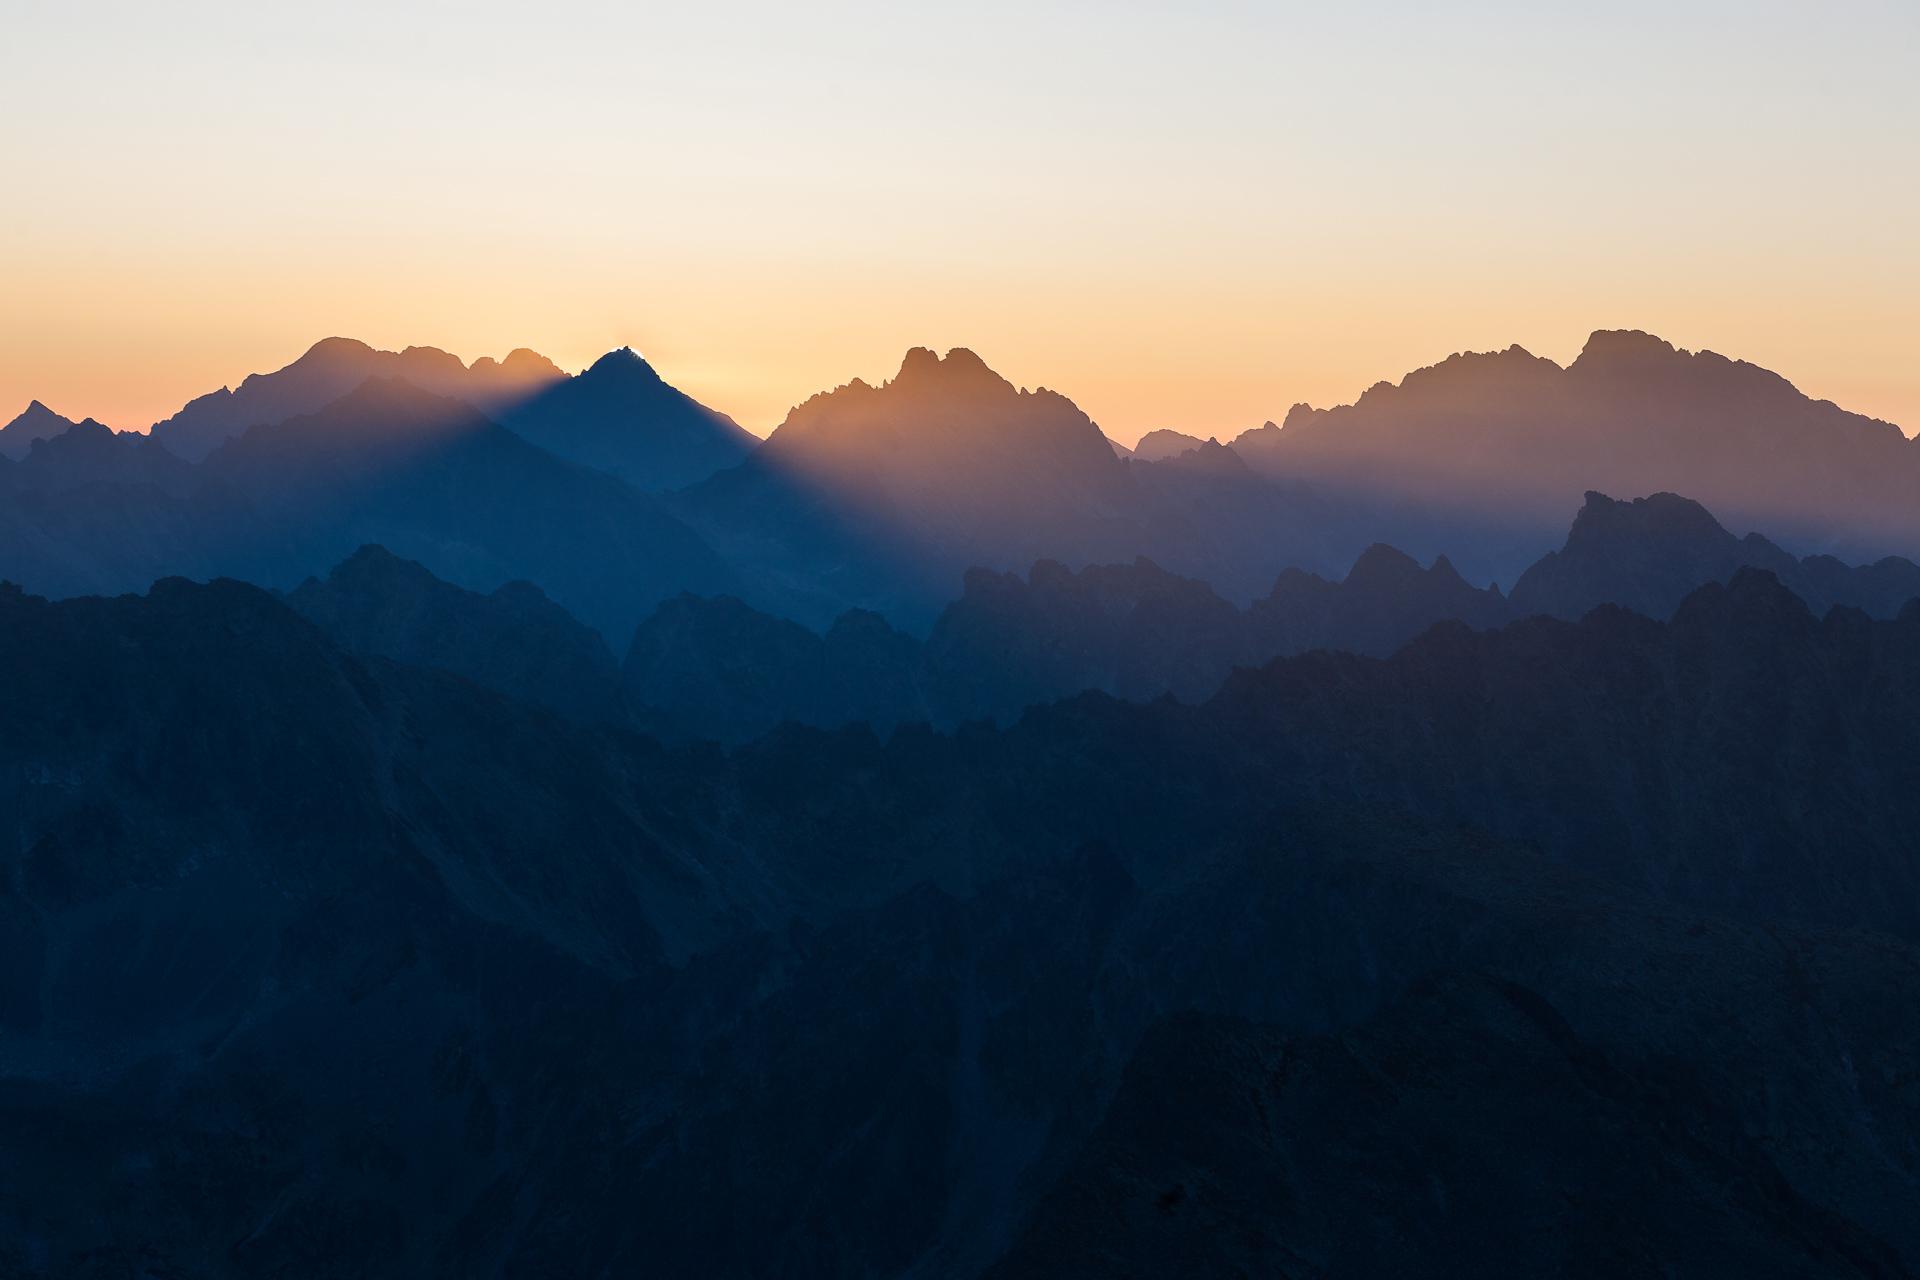 Sunrise in Slovakia